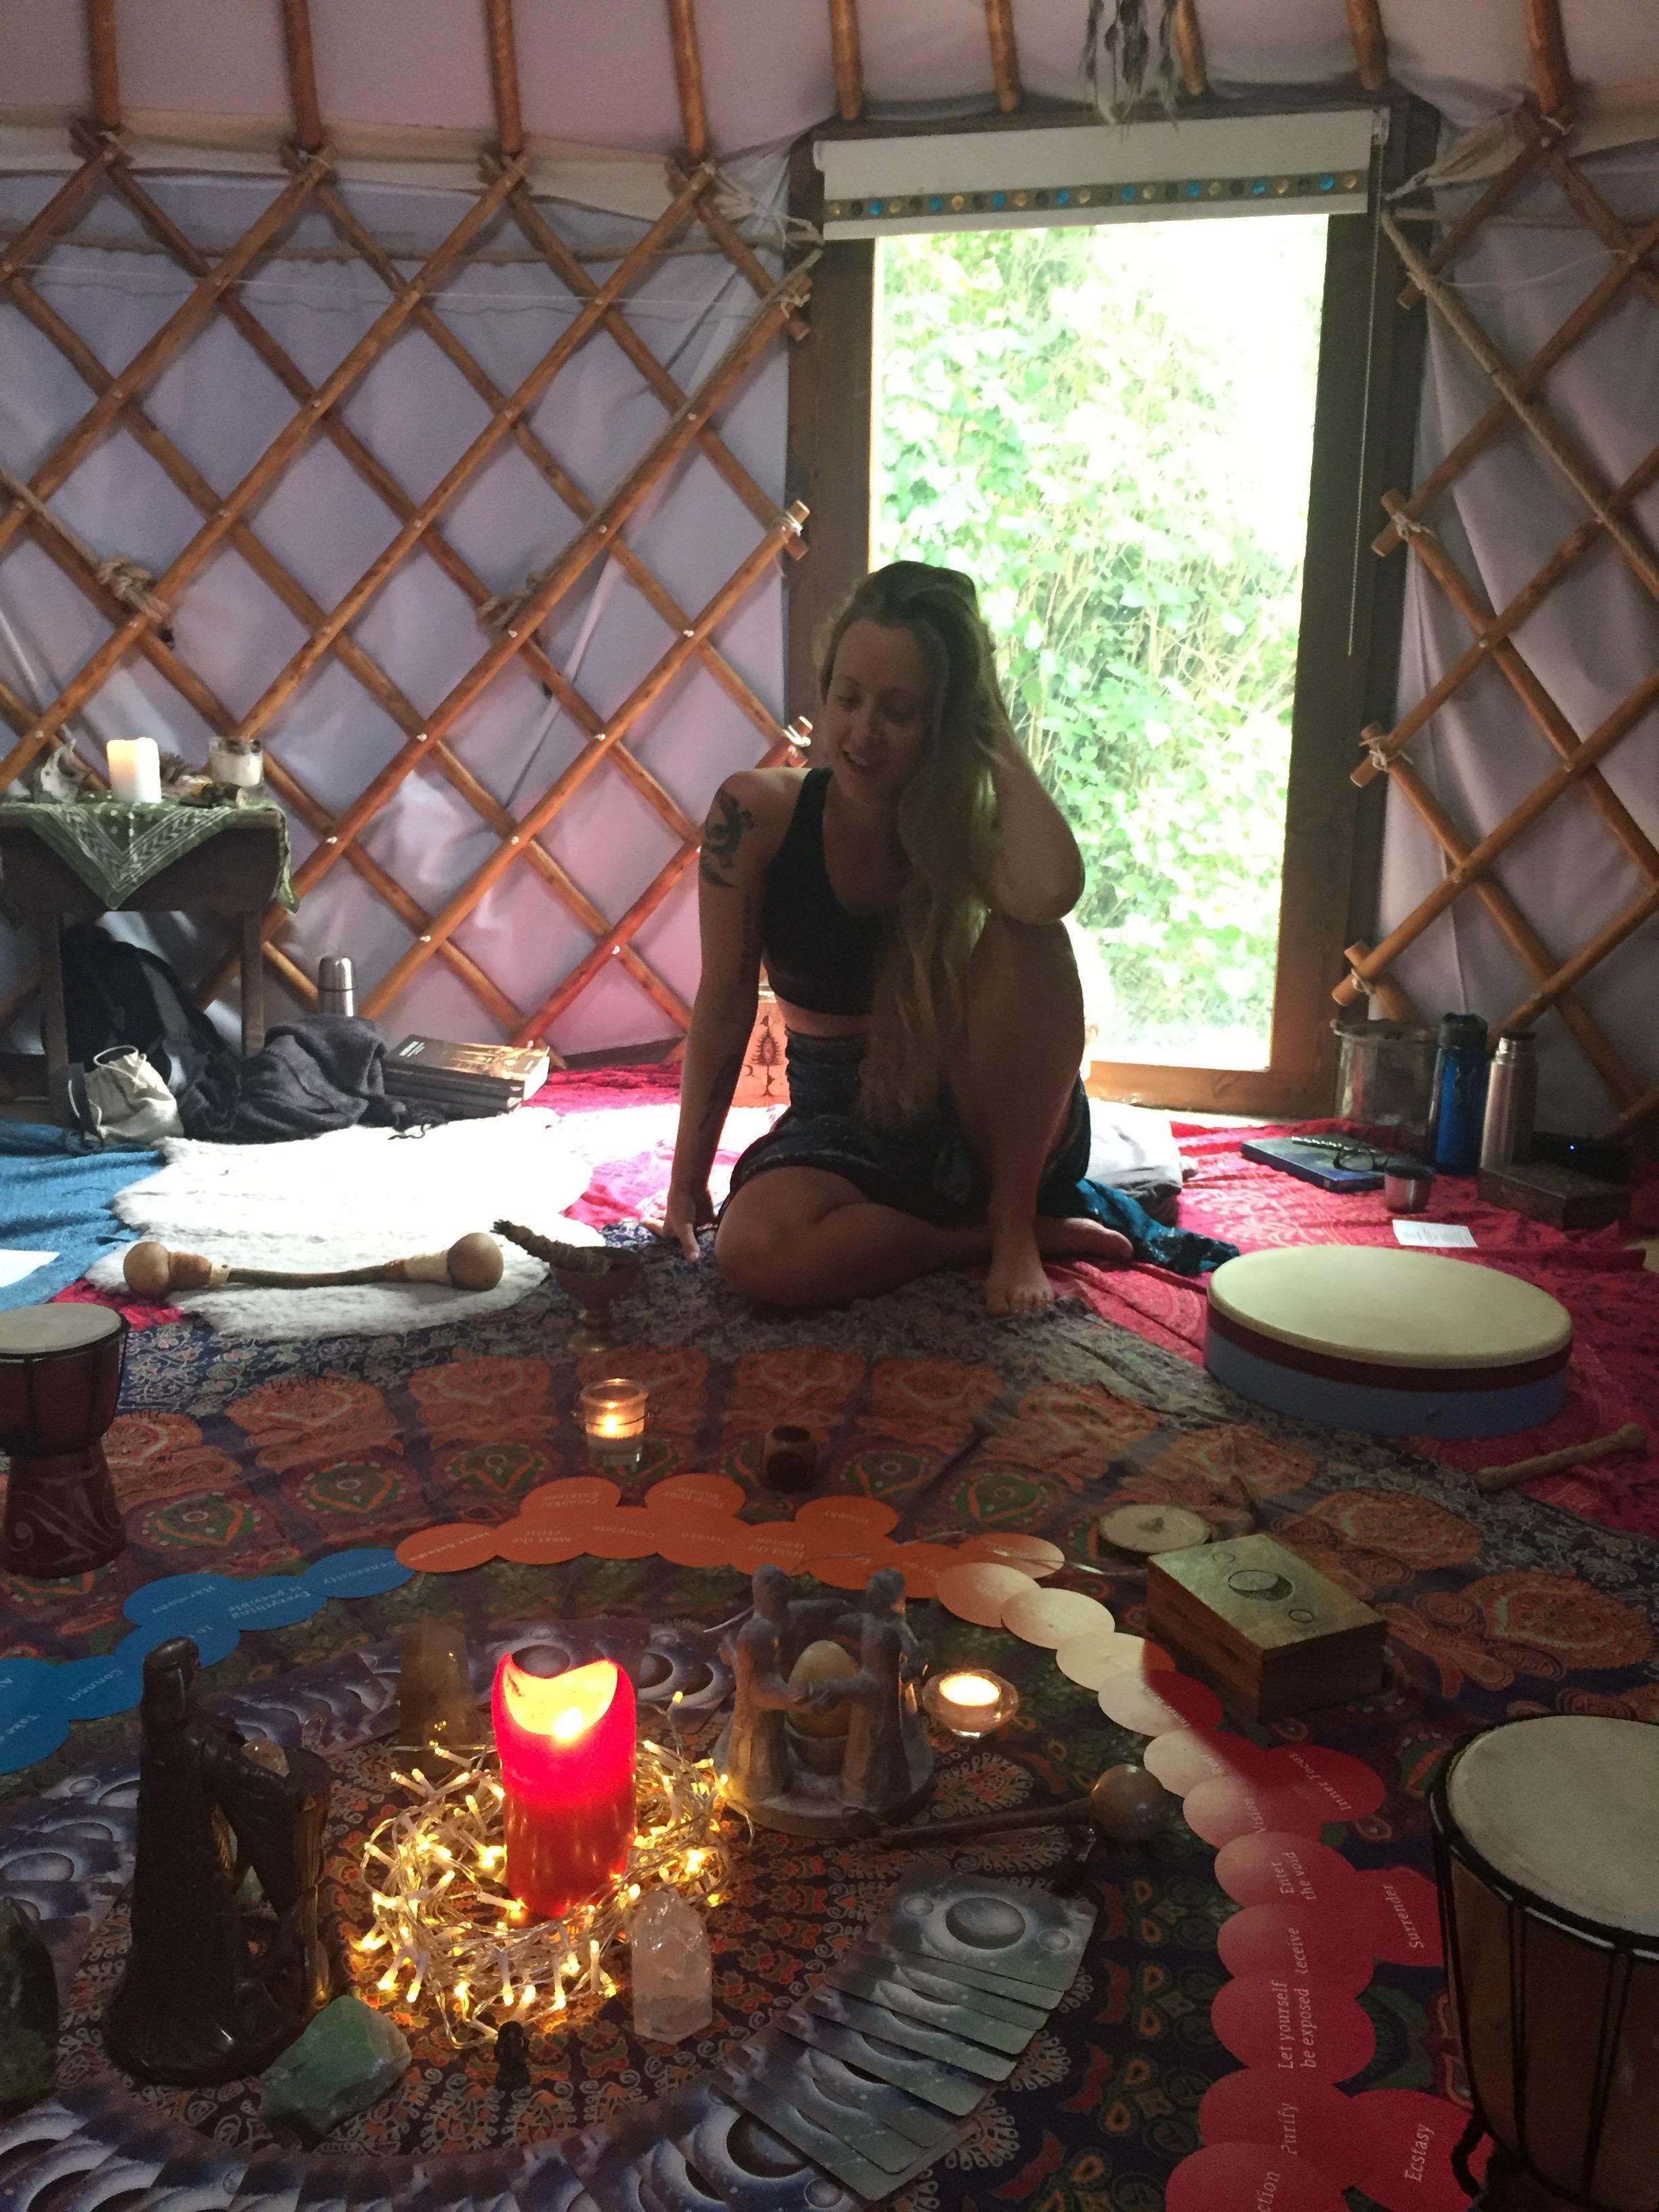 Carly in the yurt